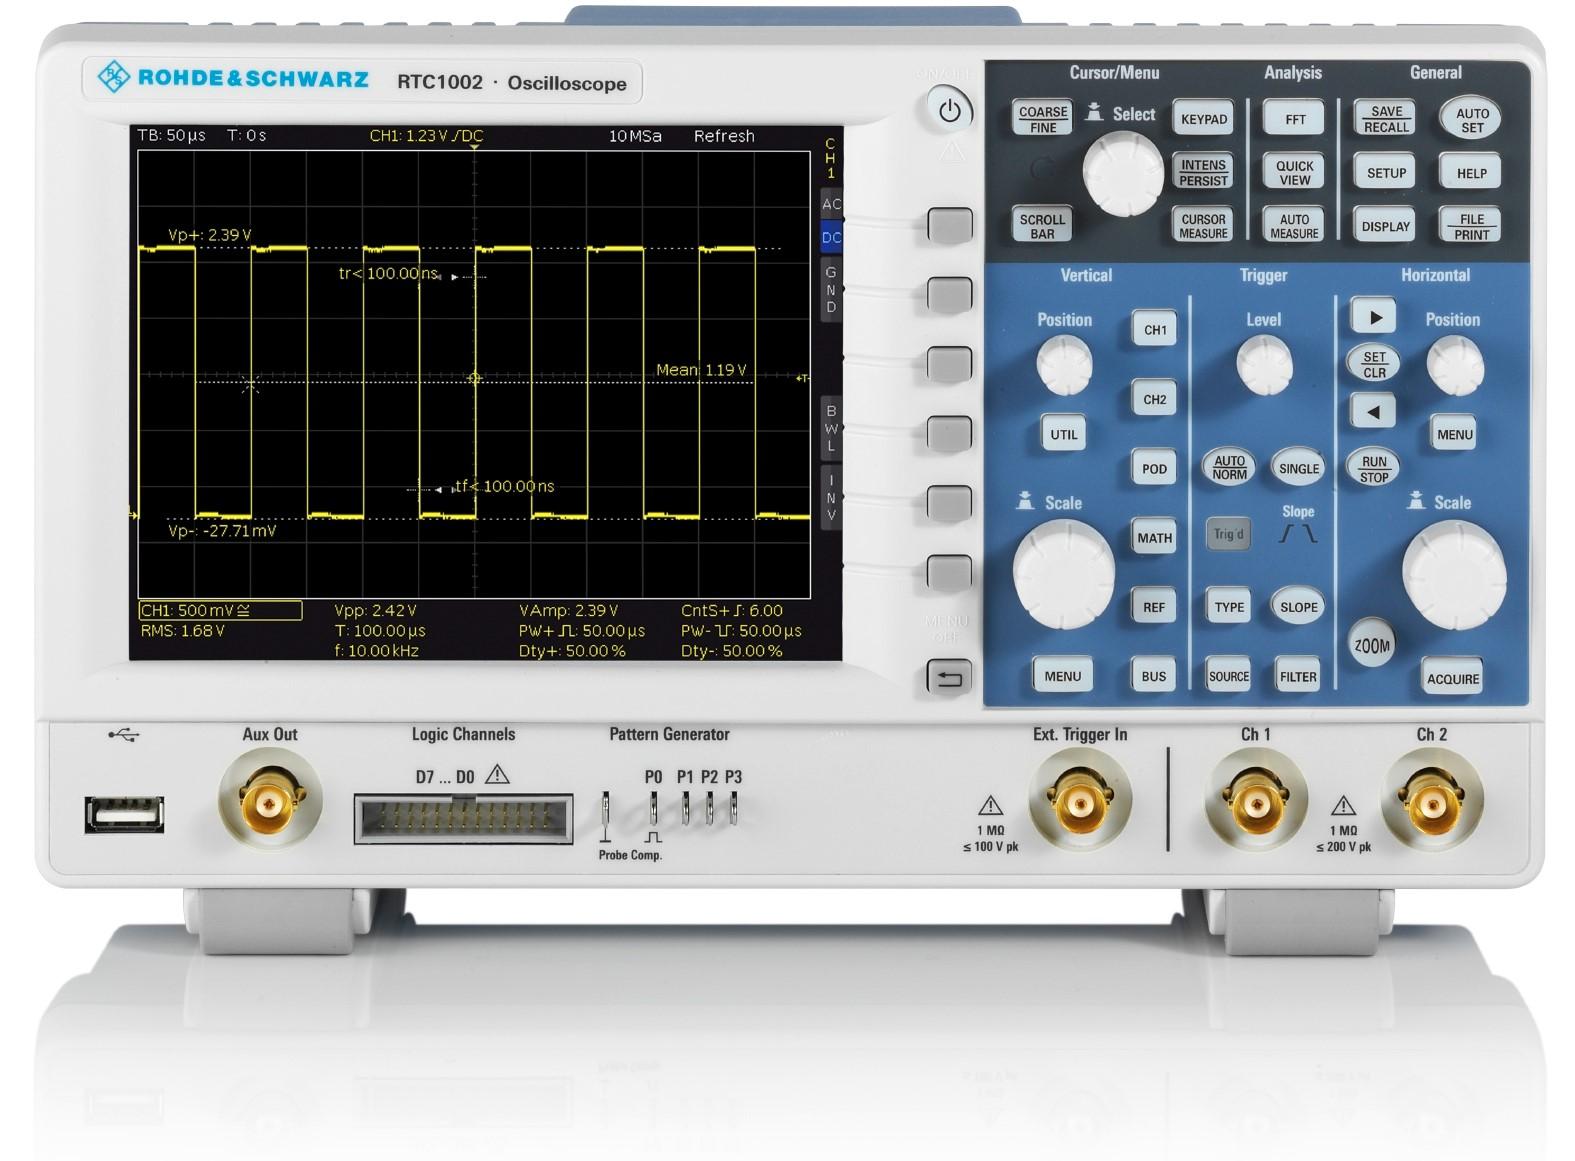 R&S RTC1000 series digital Oscilloscope